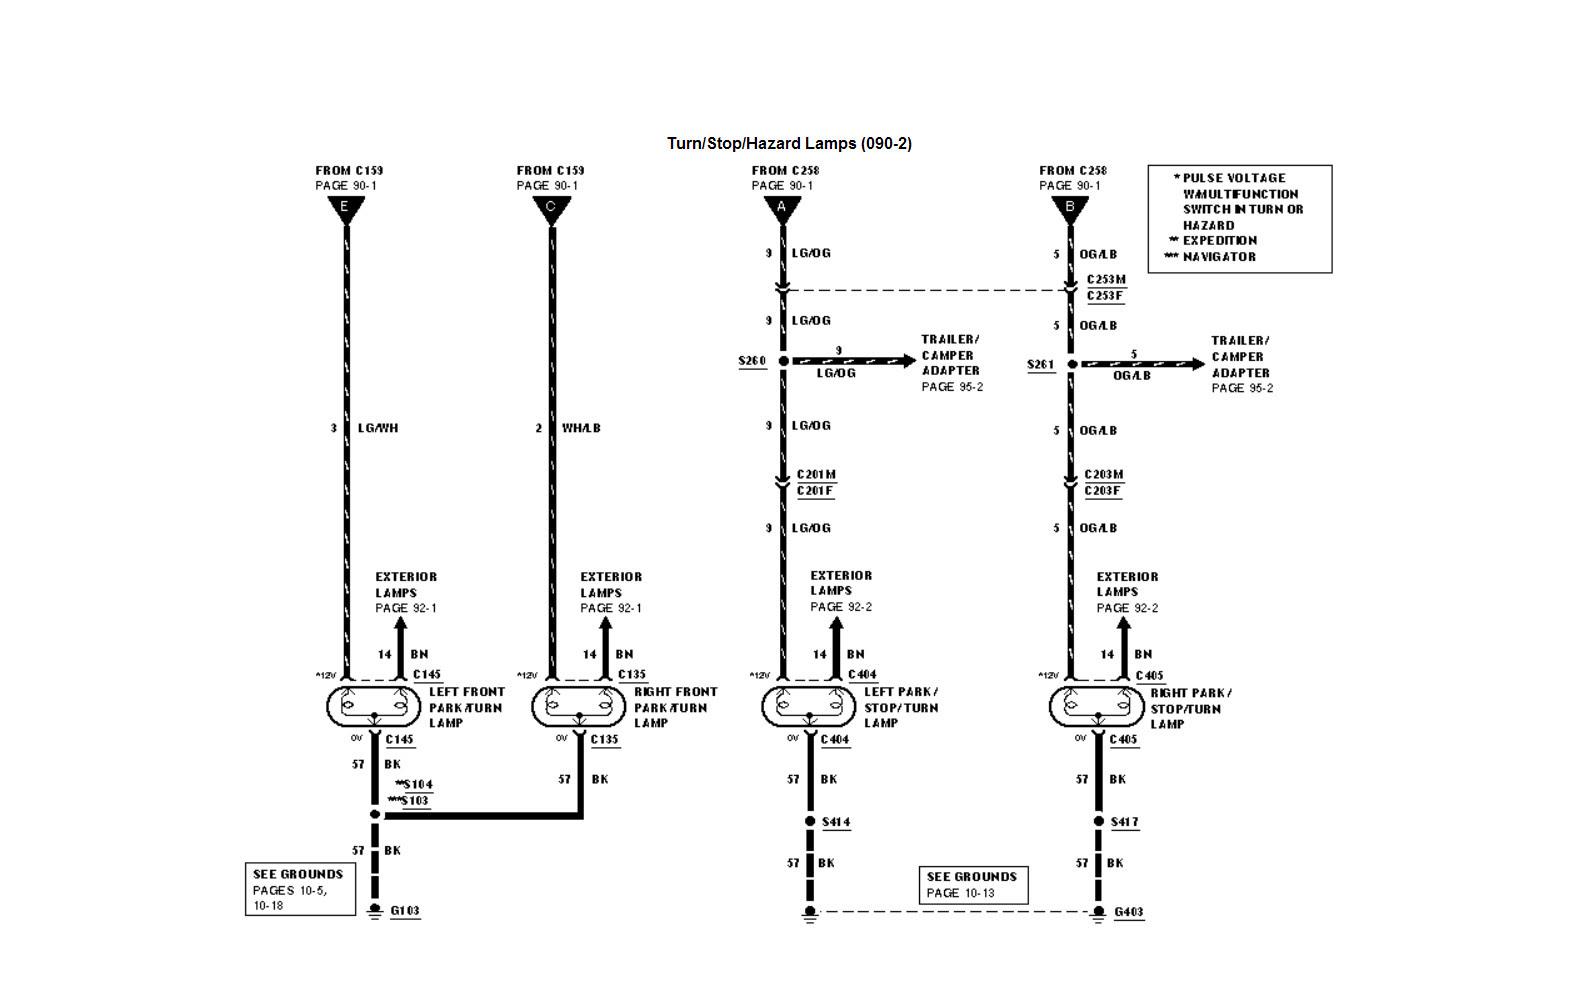 Diagram 2004 Lincoln Navigator Wiring Diagram Full Version Hd Quality Wiring Diagram Diagramauto Quartiervoieverte Fr